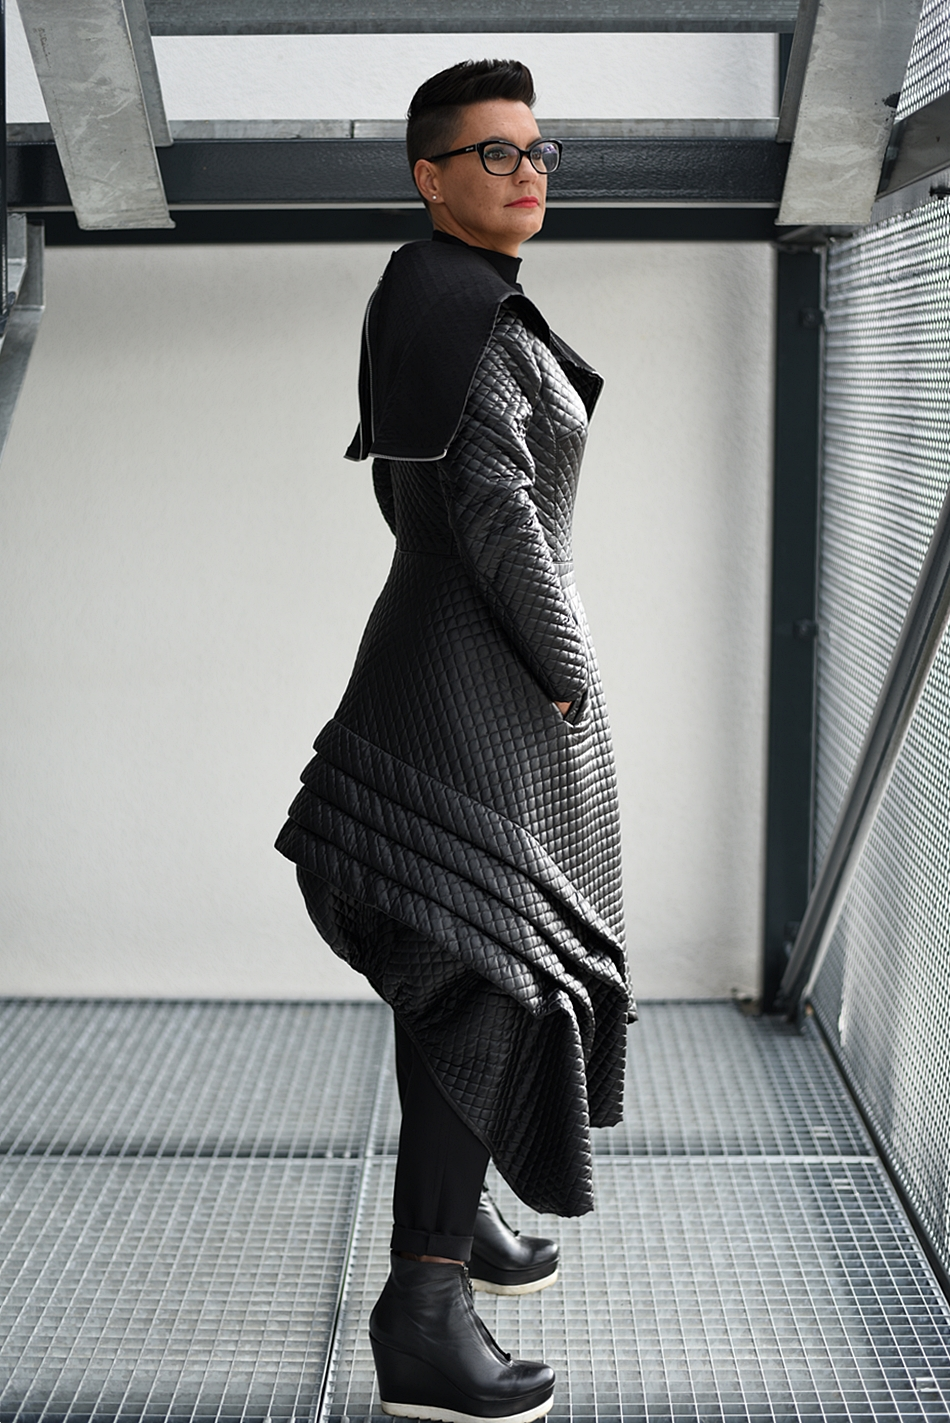 Broth_design_clothes_065